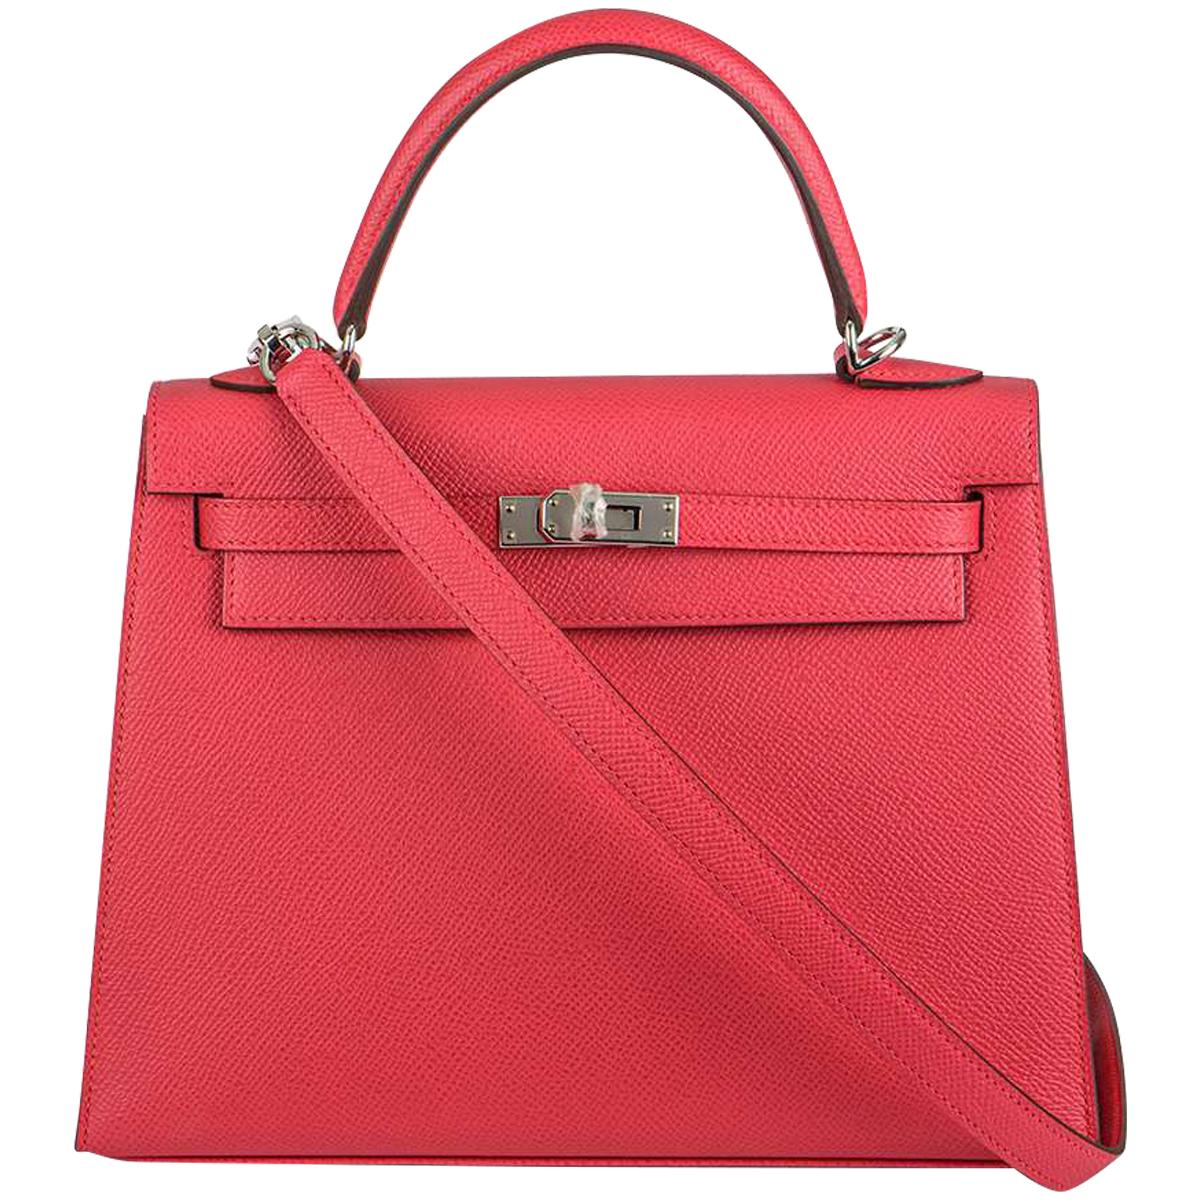 Hermès  Kelly II Sellier 25cm Epsom Rose Extreme PHW New